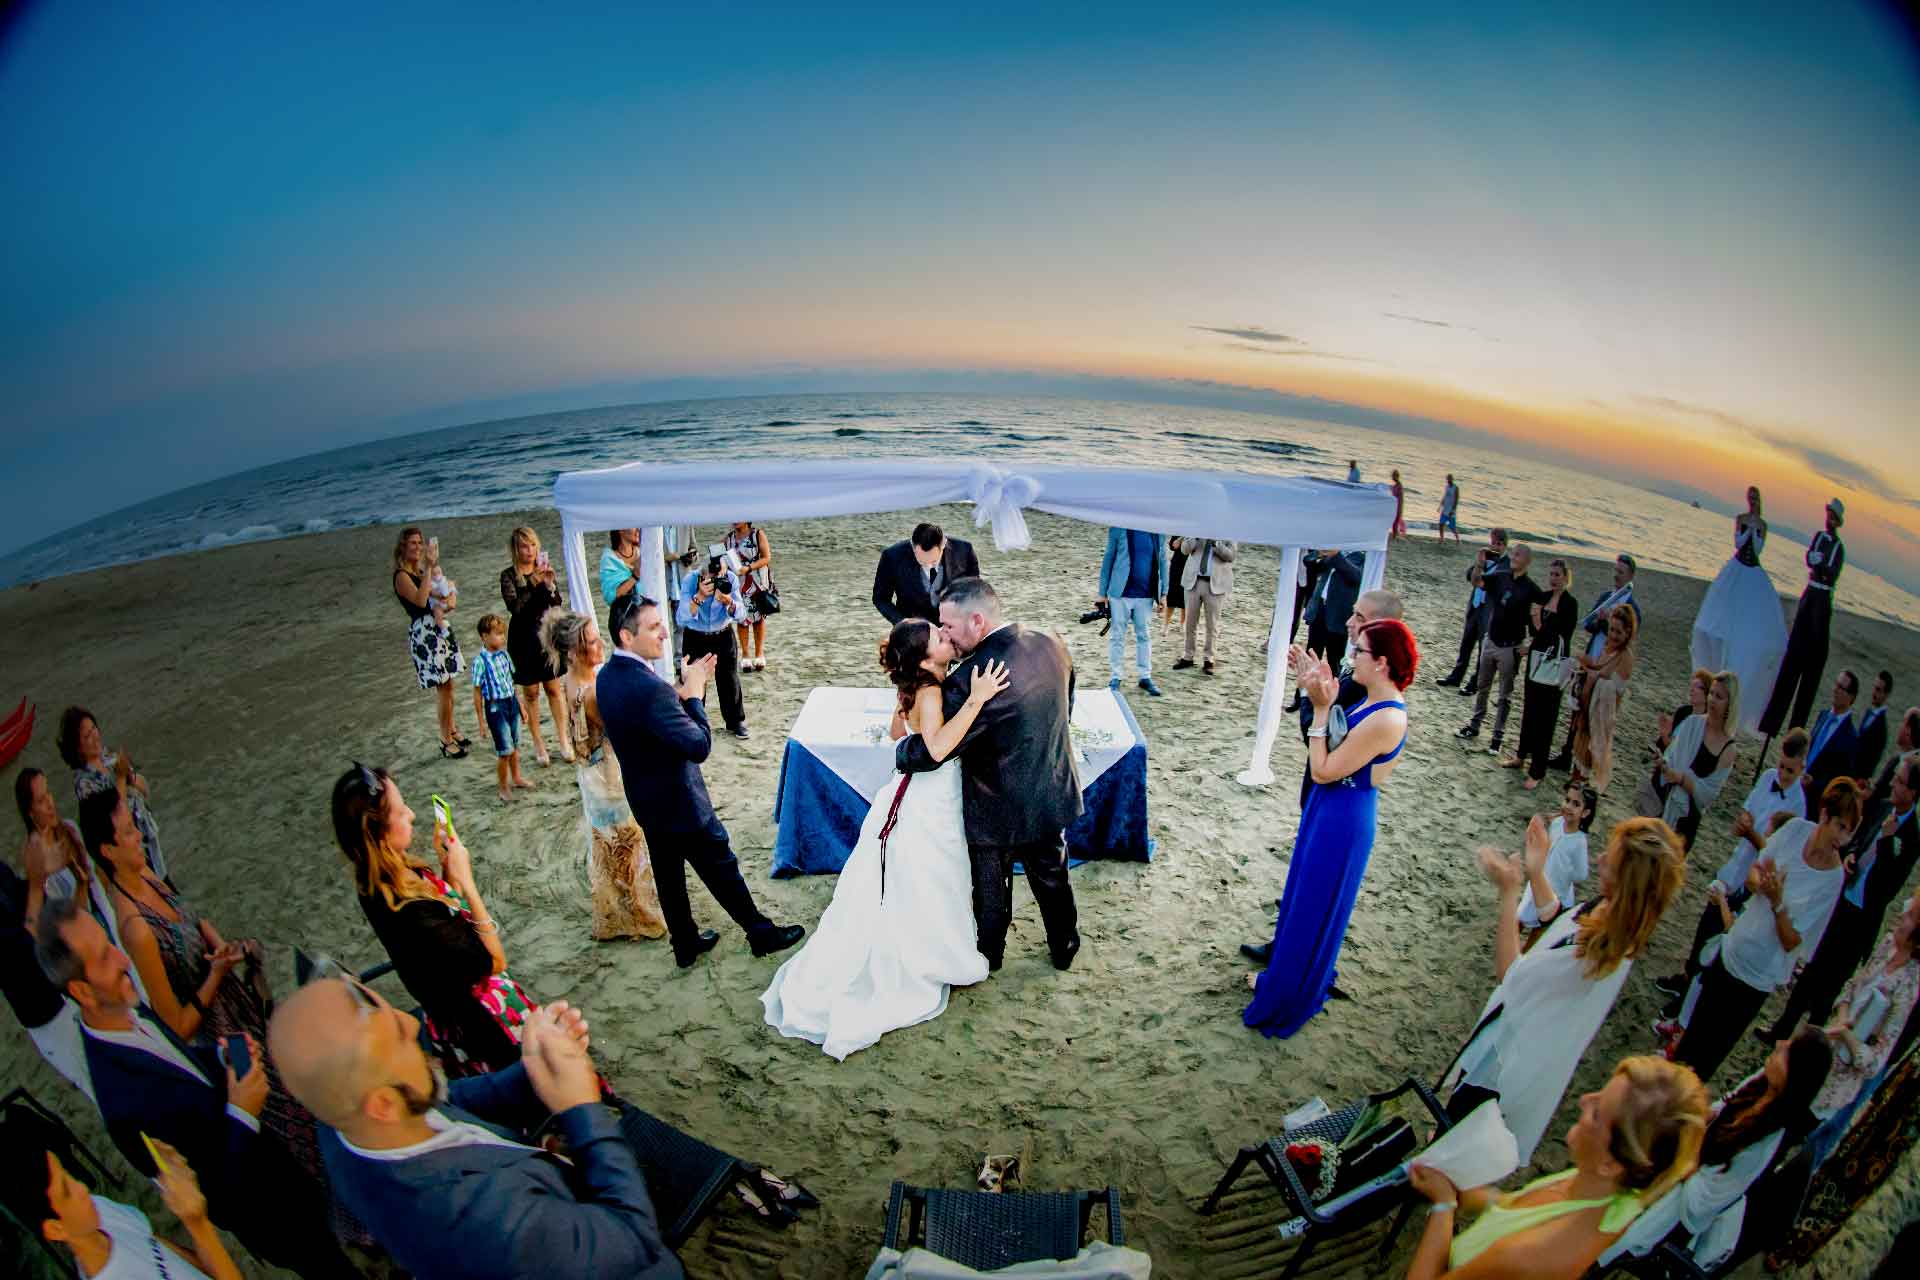 Matrimonio Spiaggia Versilia : Bussola club versilia wedding matrimoni in riva al mare